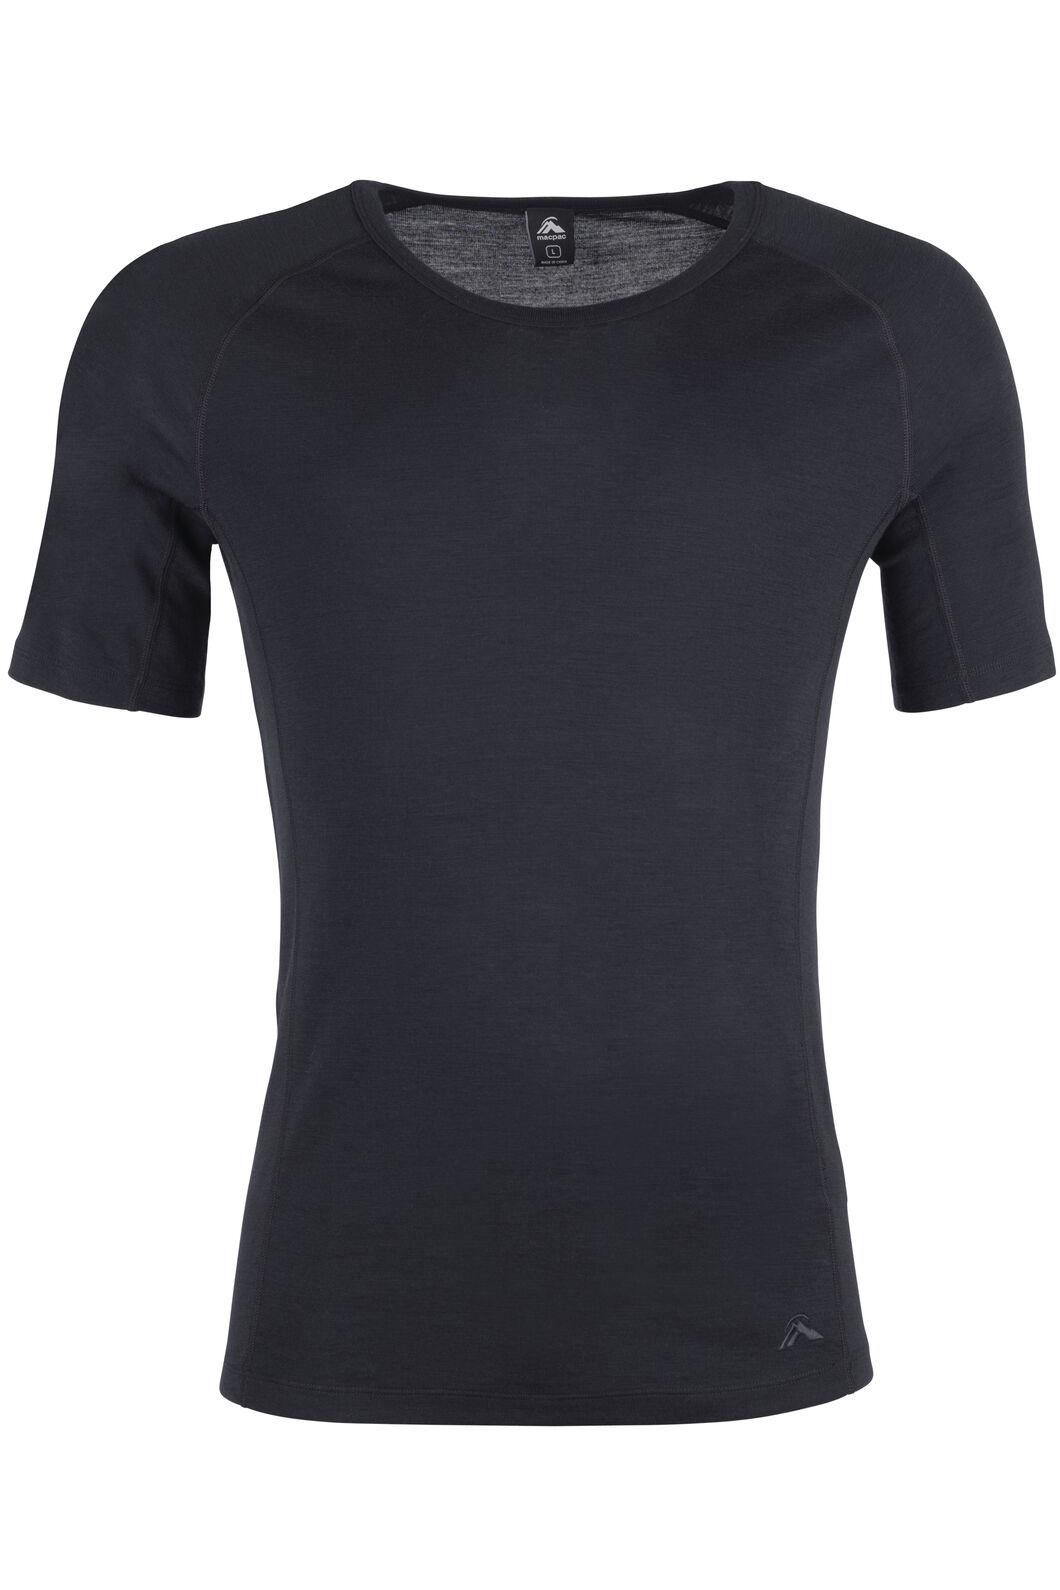 220 Merino Short Sleeve Top - Men's, Black, hi-res